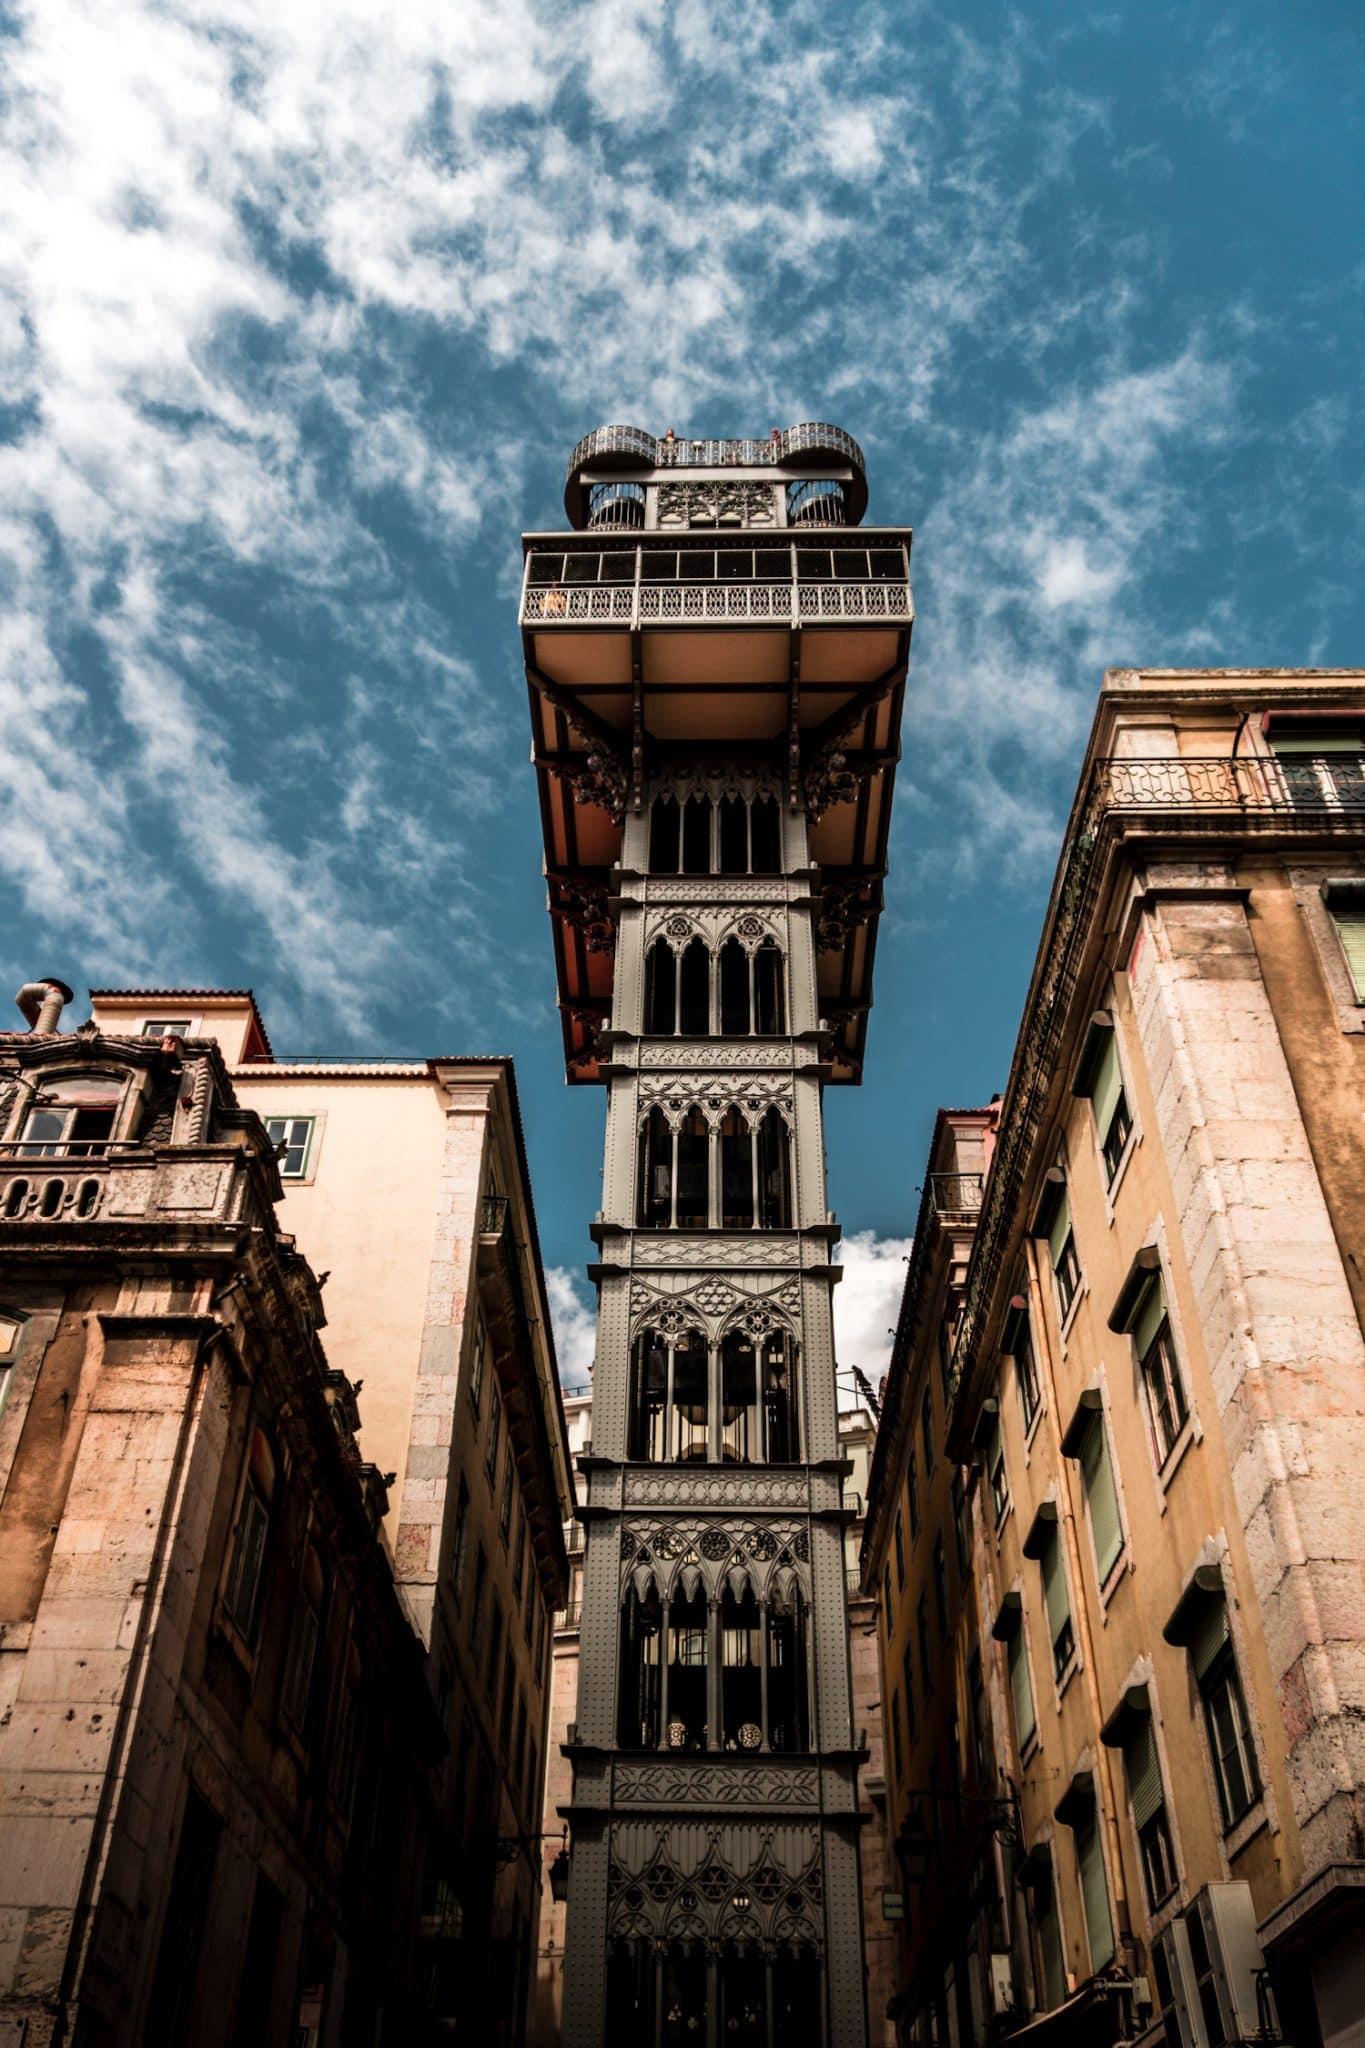 Santa Justa Lift - Lisbon Portugal The Travel Escape 5